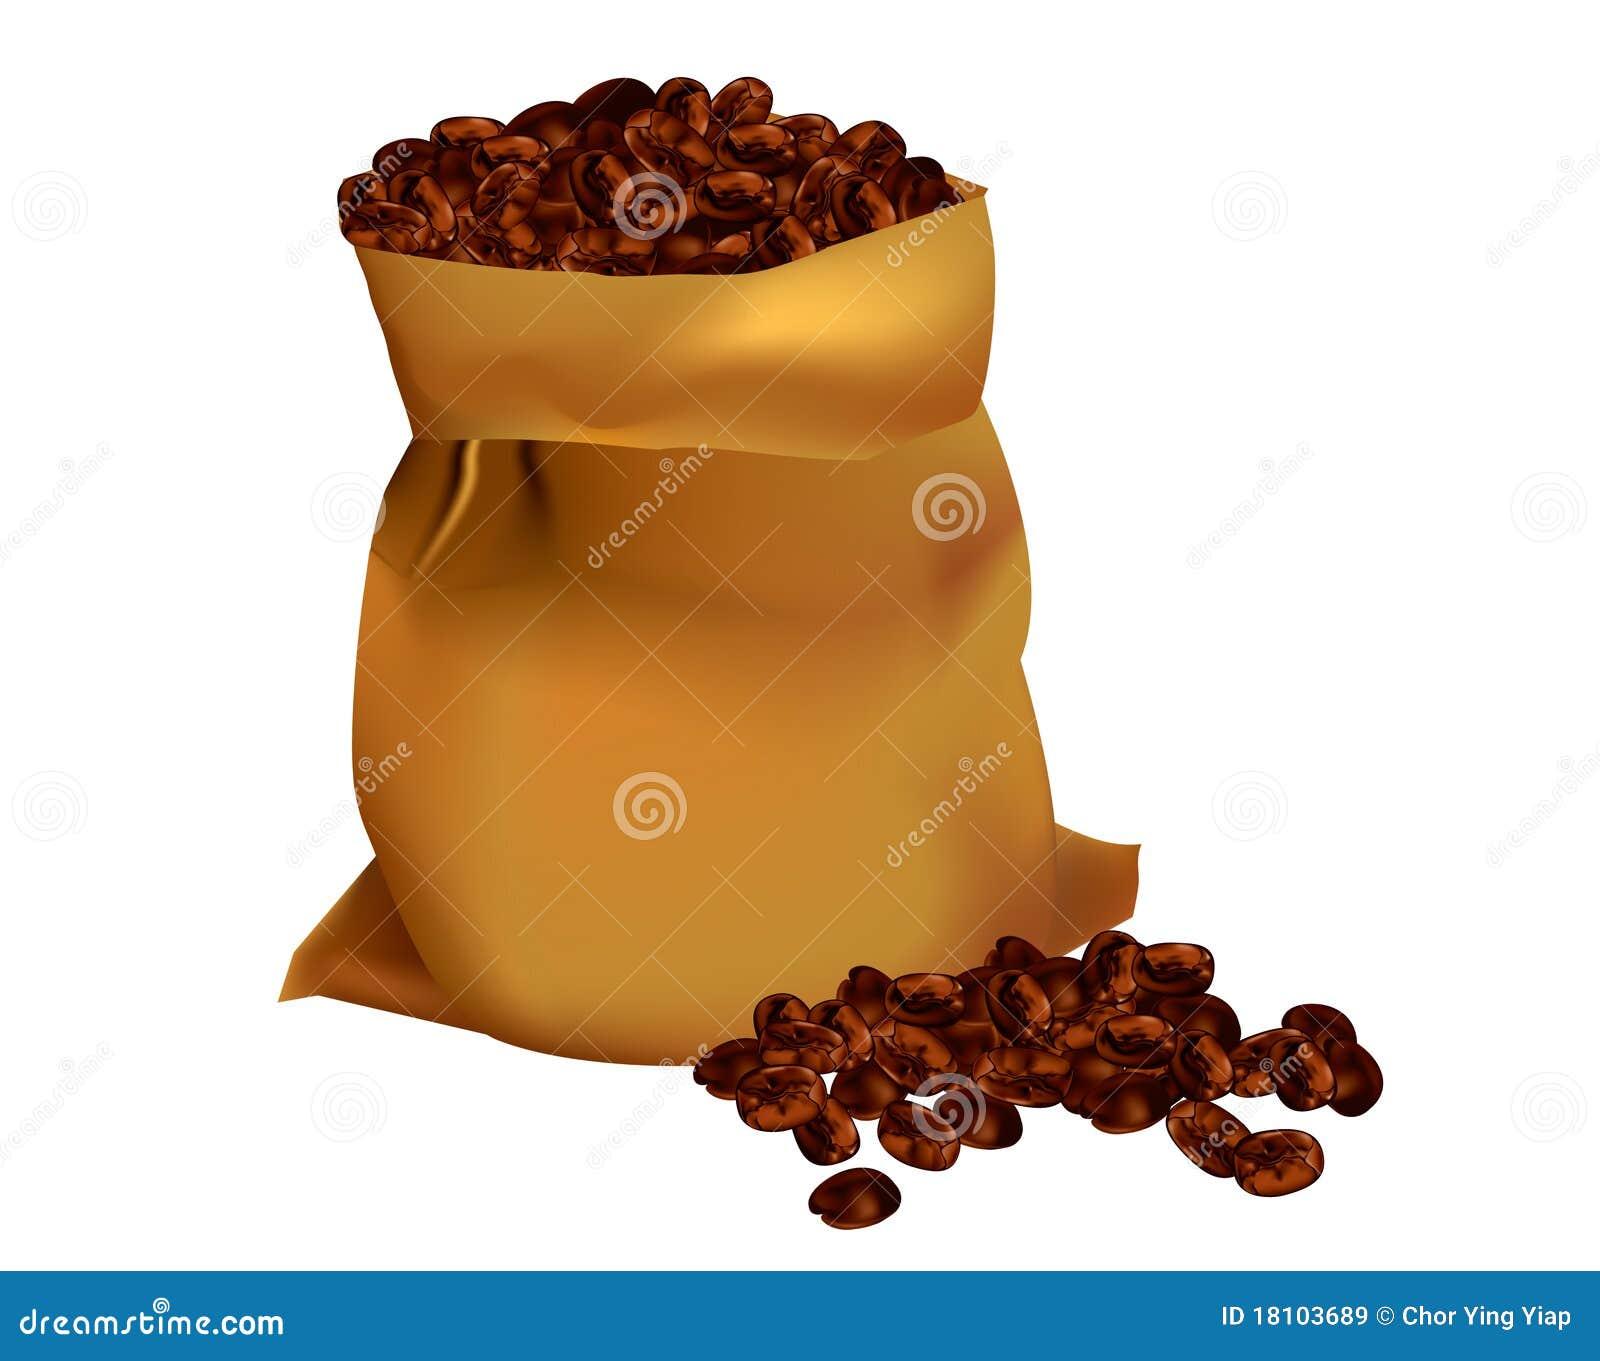 Sac de grains de café